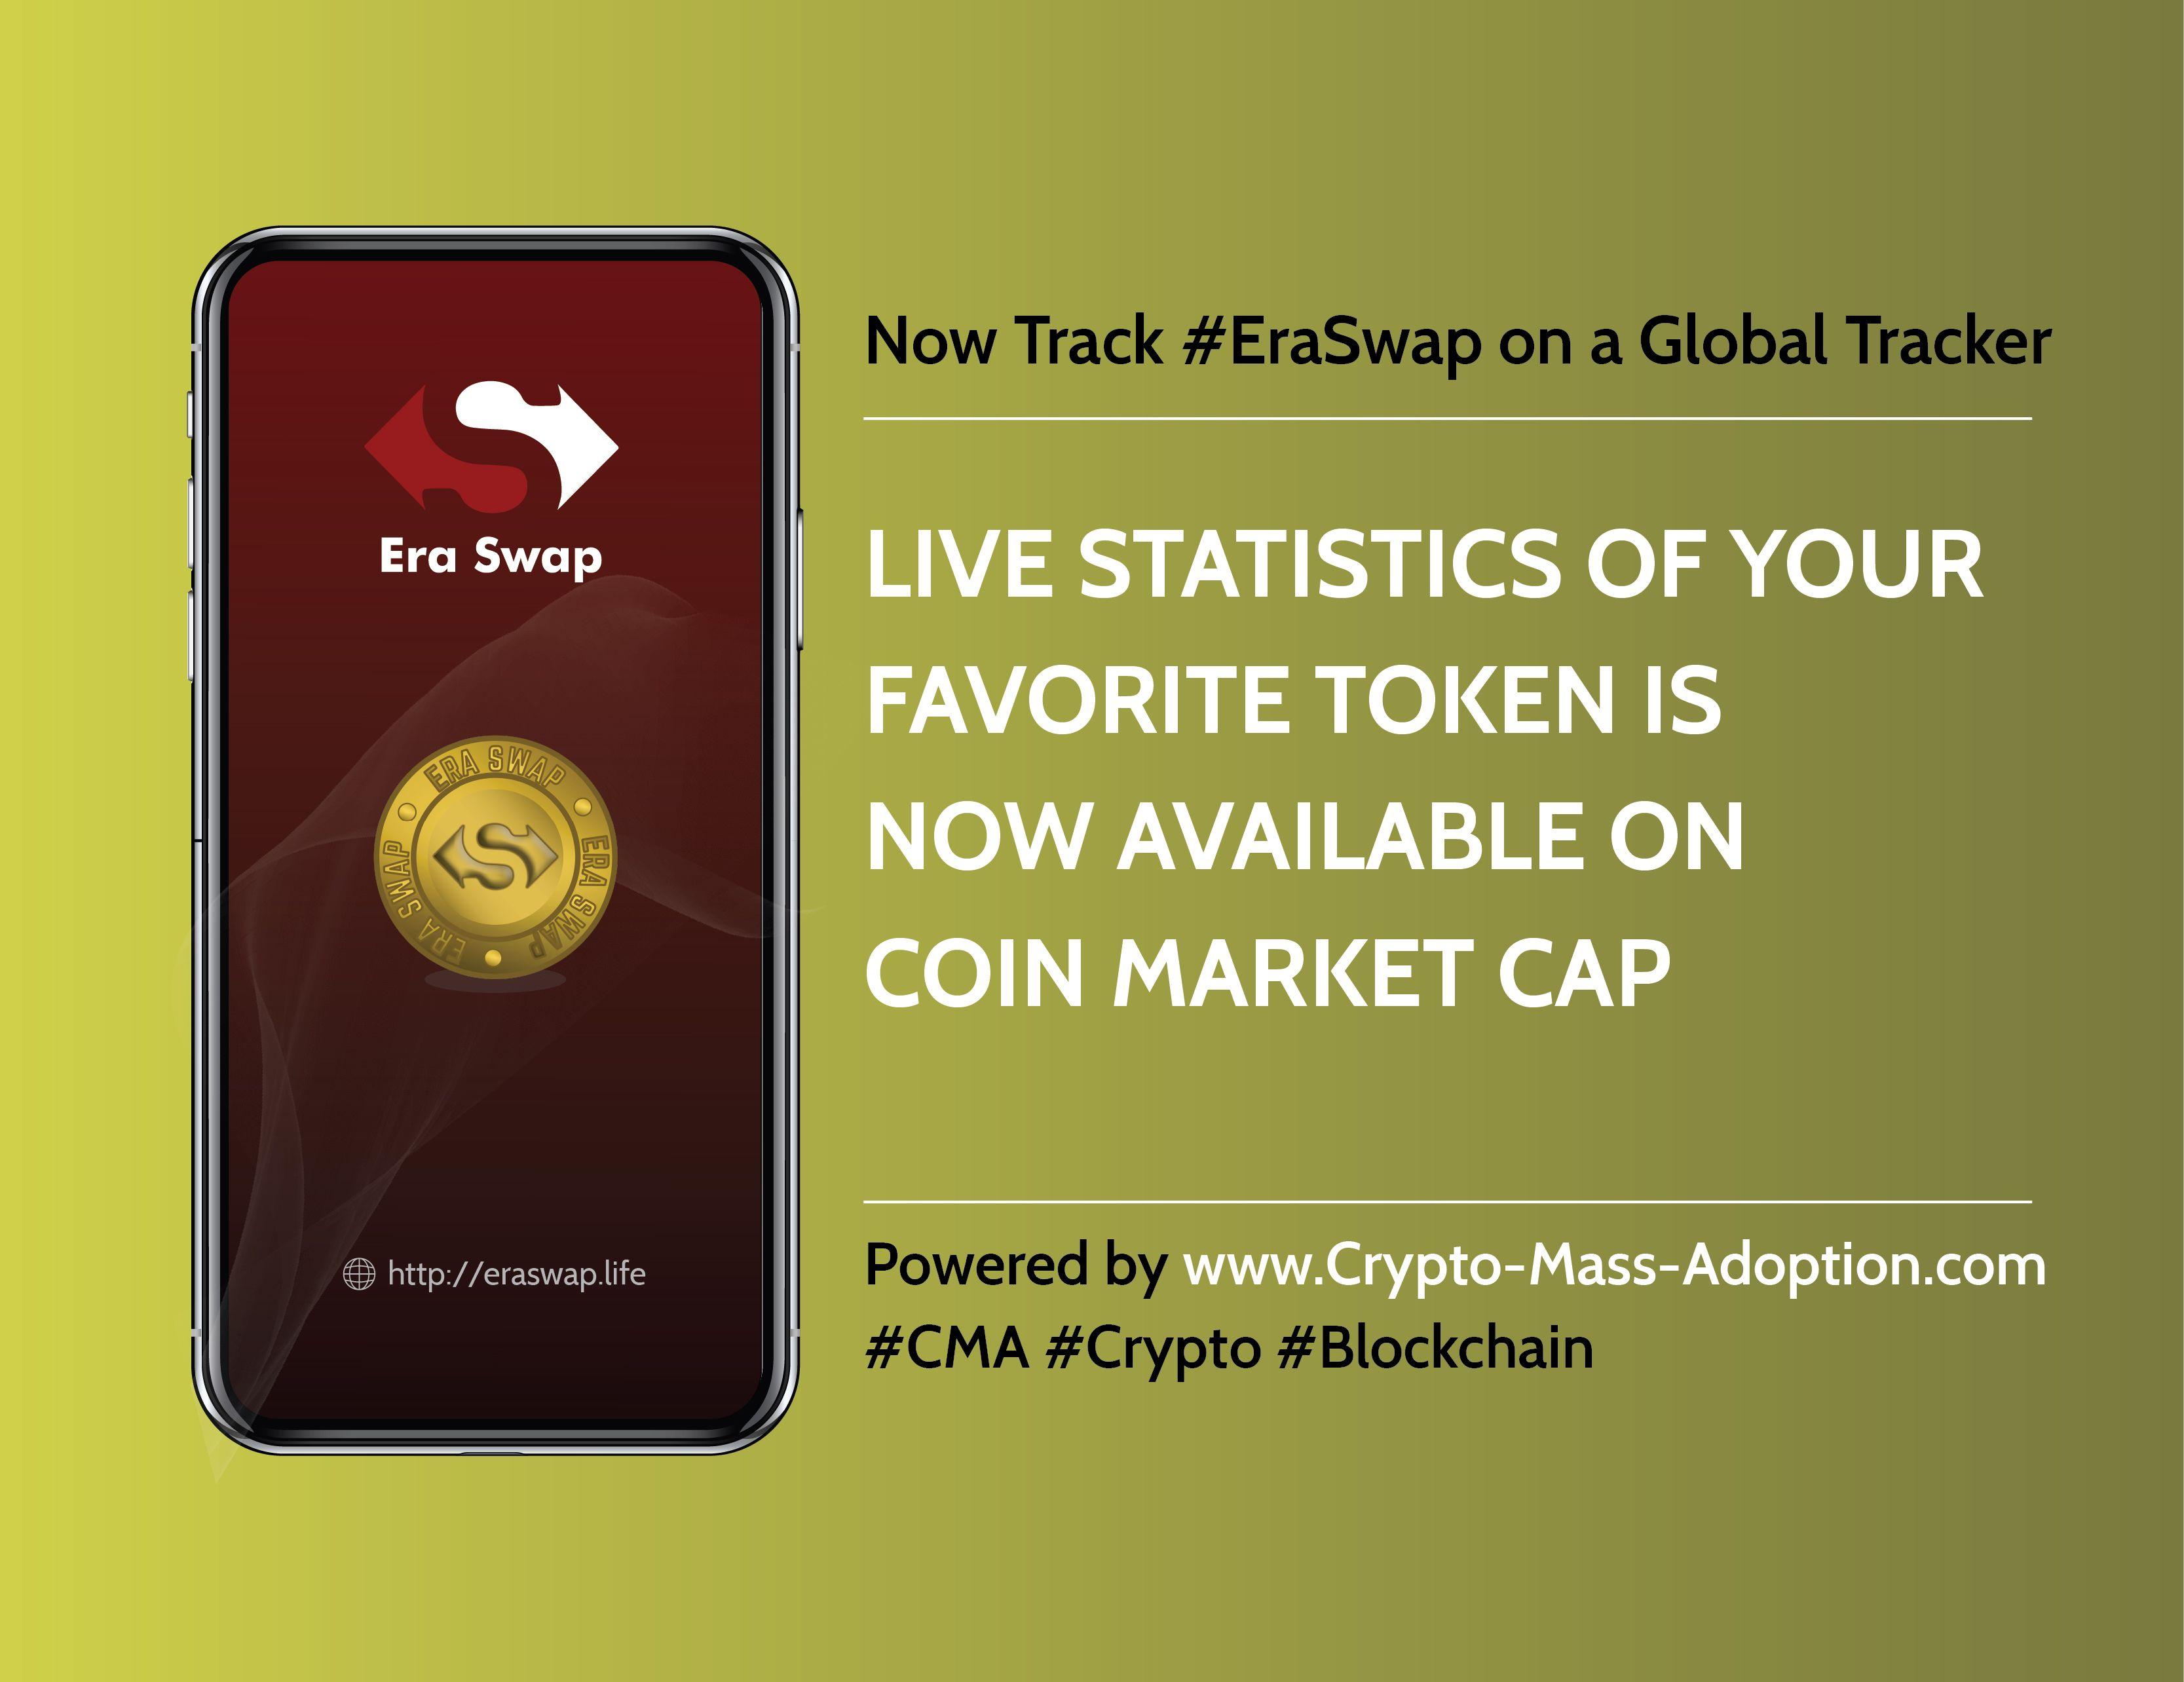 Era Swap Live Statistics Are Available On The Coin Market Cap Coin Market Blockchain Technology Freelance Marketing